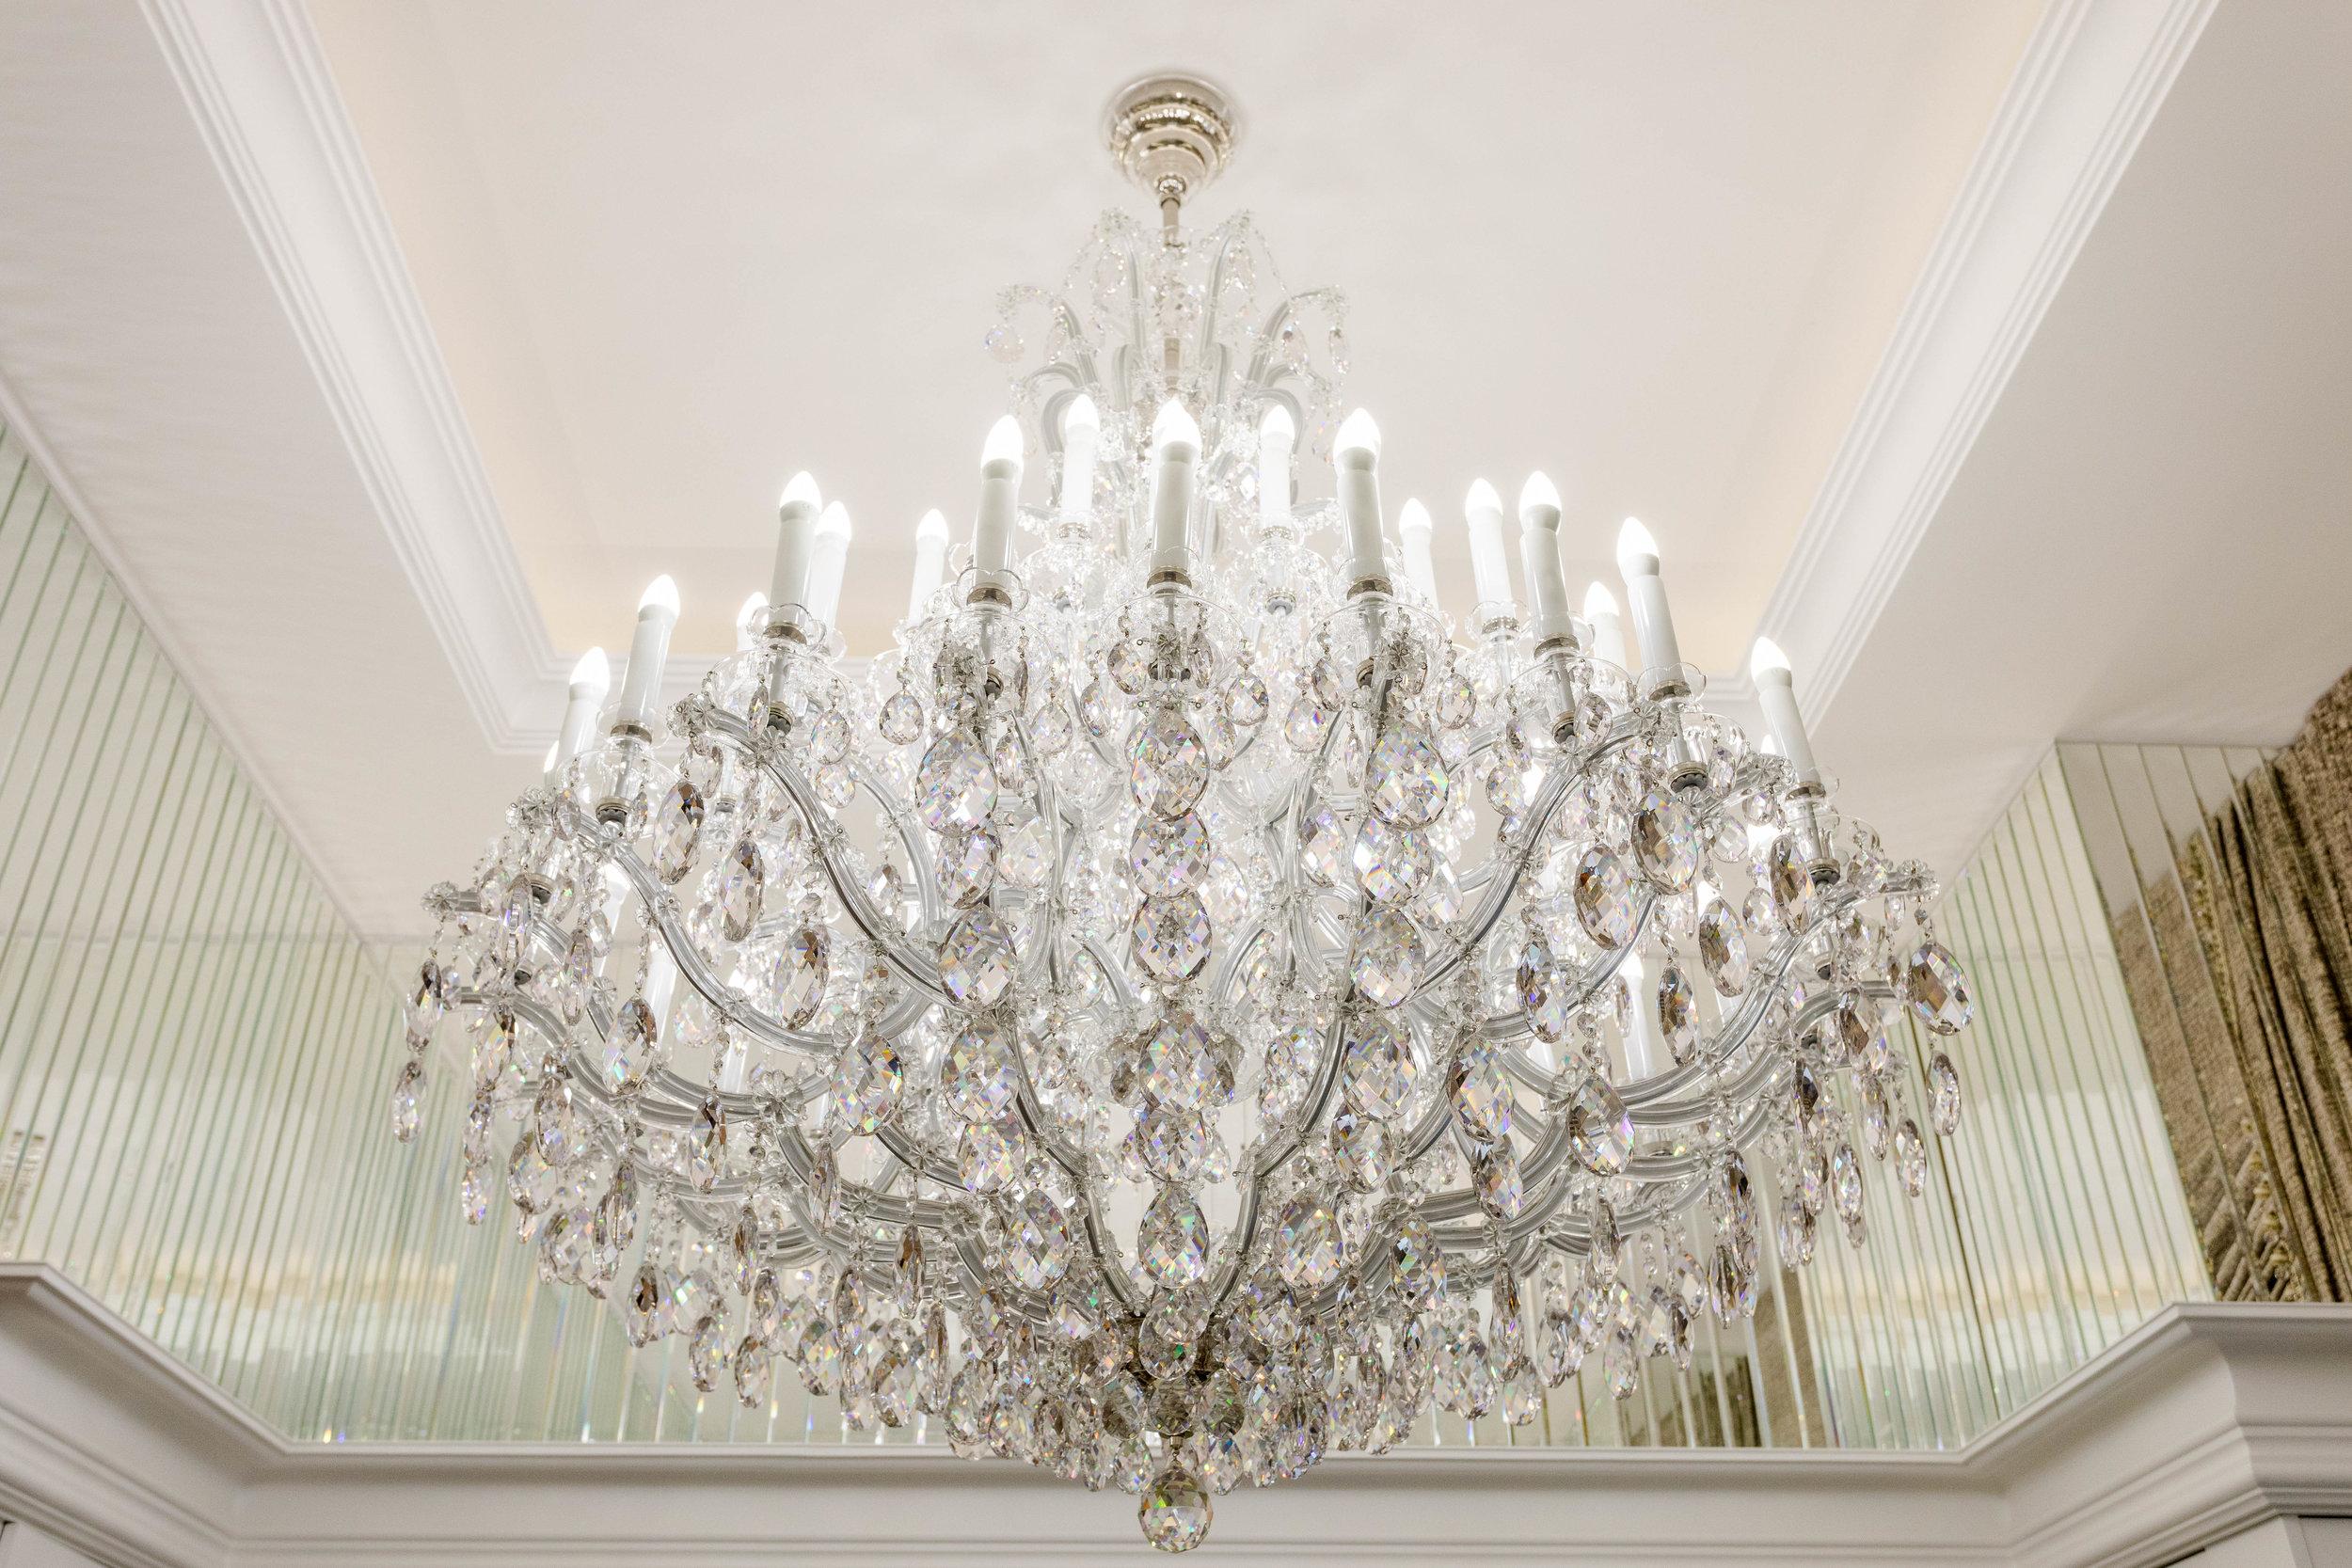 maria-theresa-crystal-chandelier-2.jpg